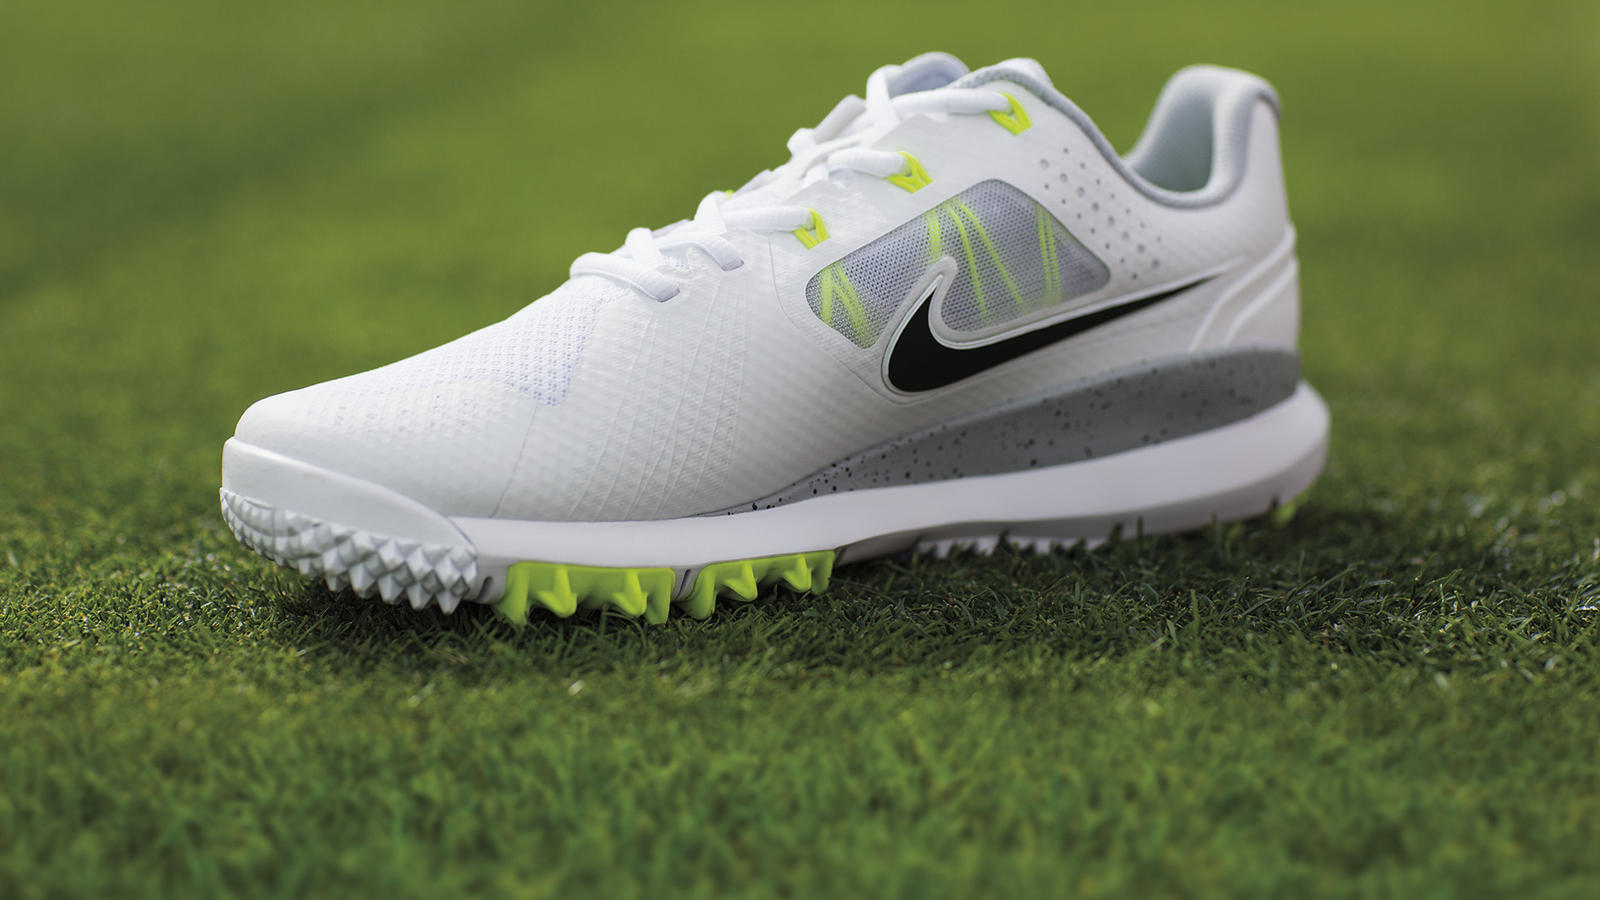 TW' 14 Mesh Shoe - Nike